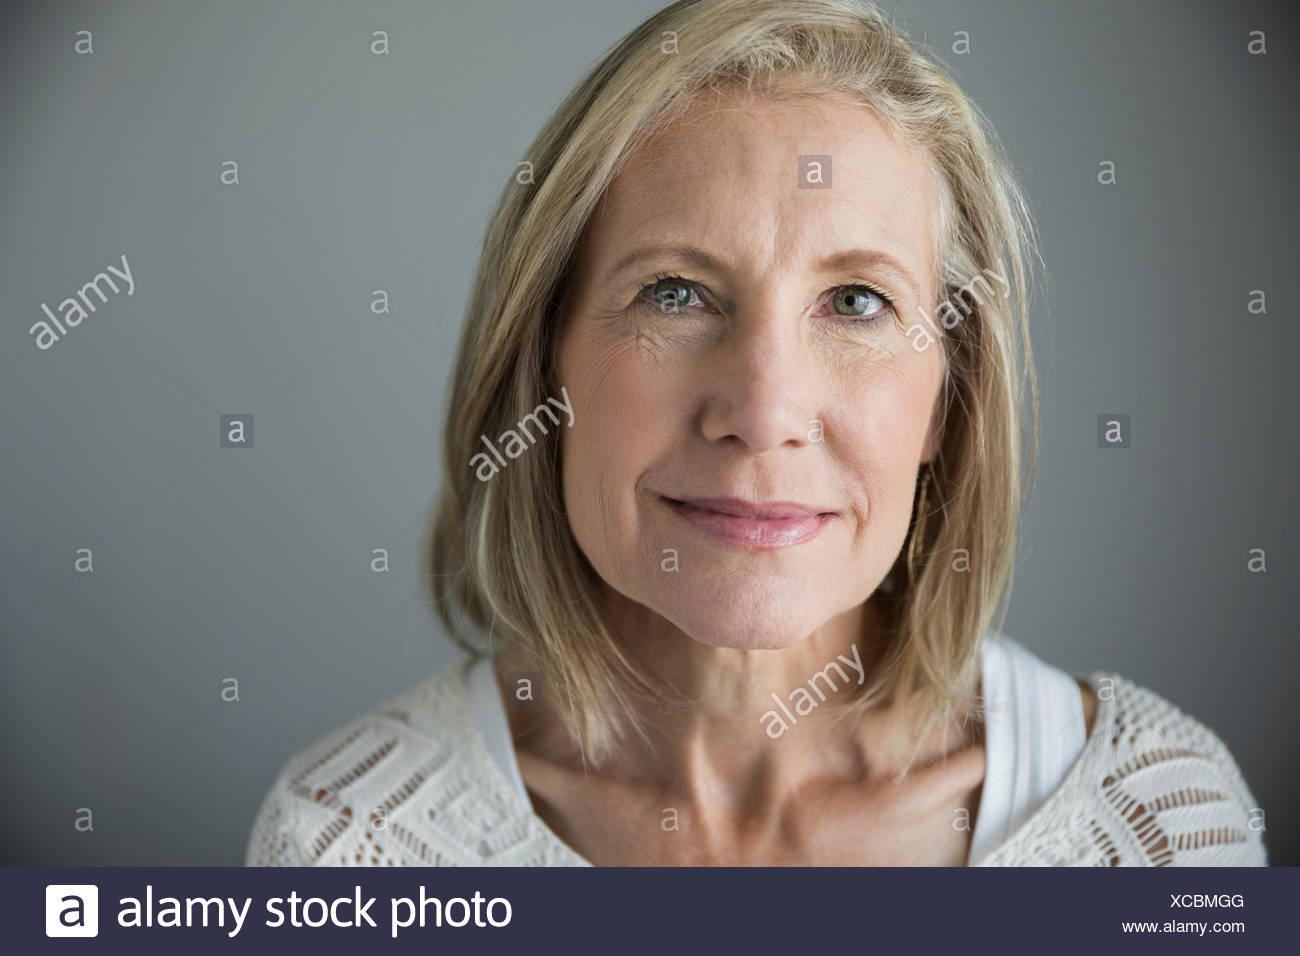 Retrato senior sonriente mujer con cabello rubio Imagen De Stock